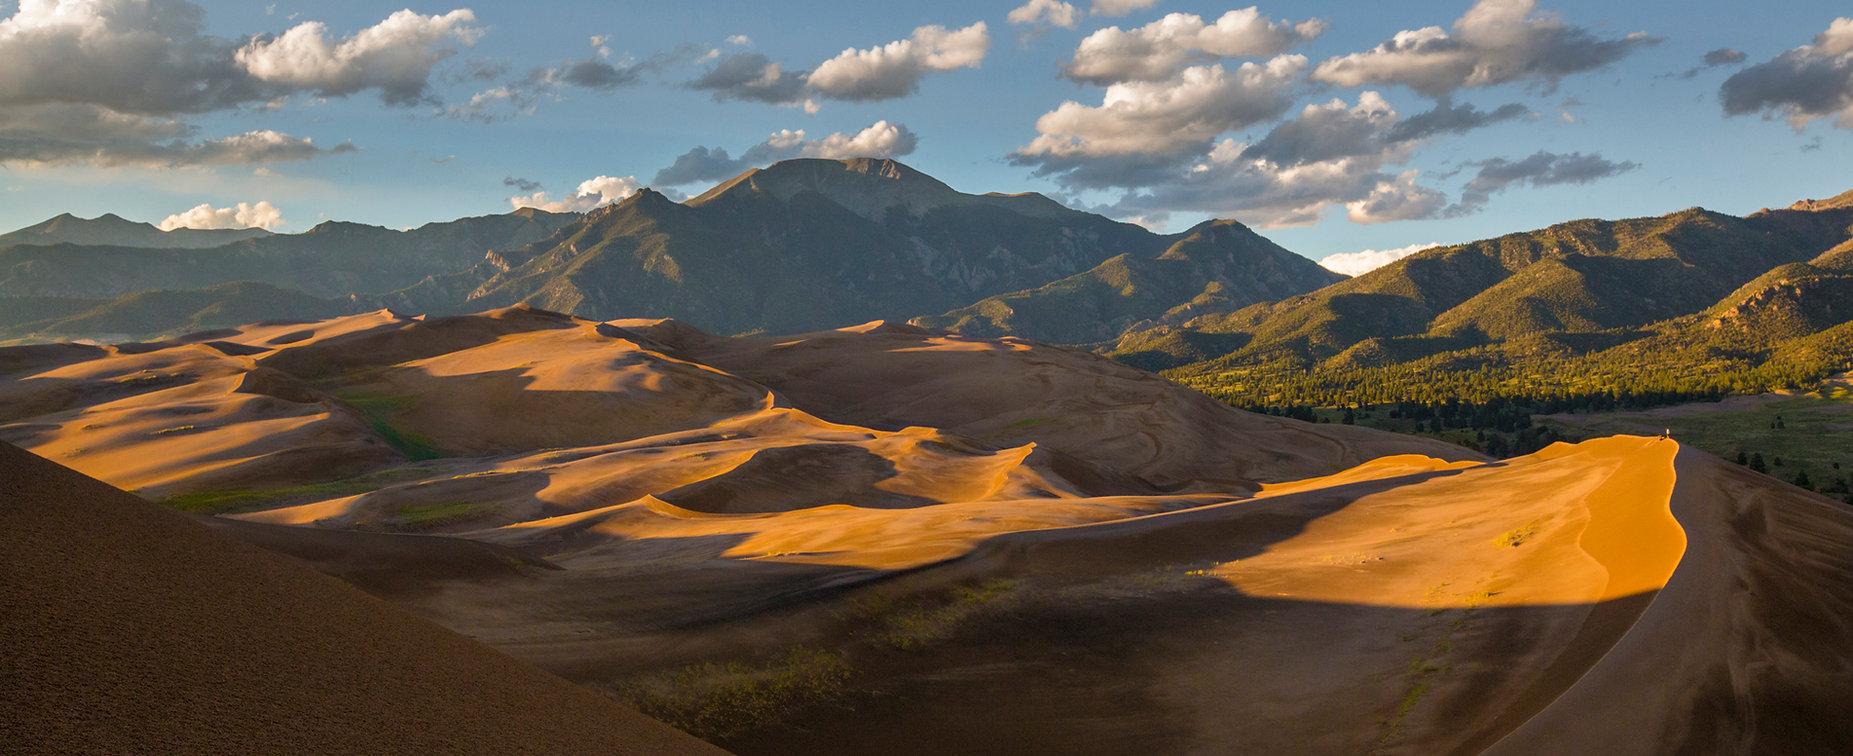 001.Great Sand Dunes.jpg